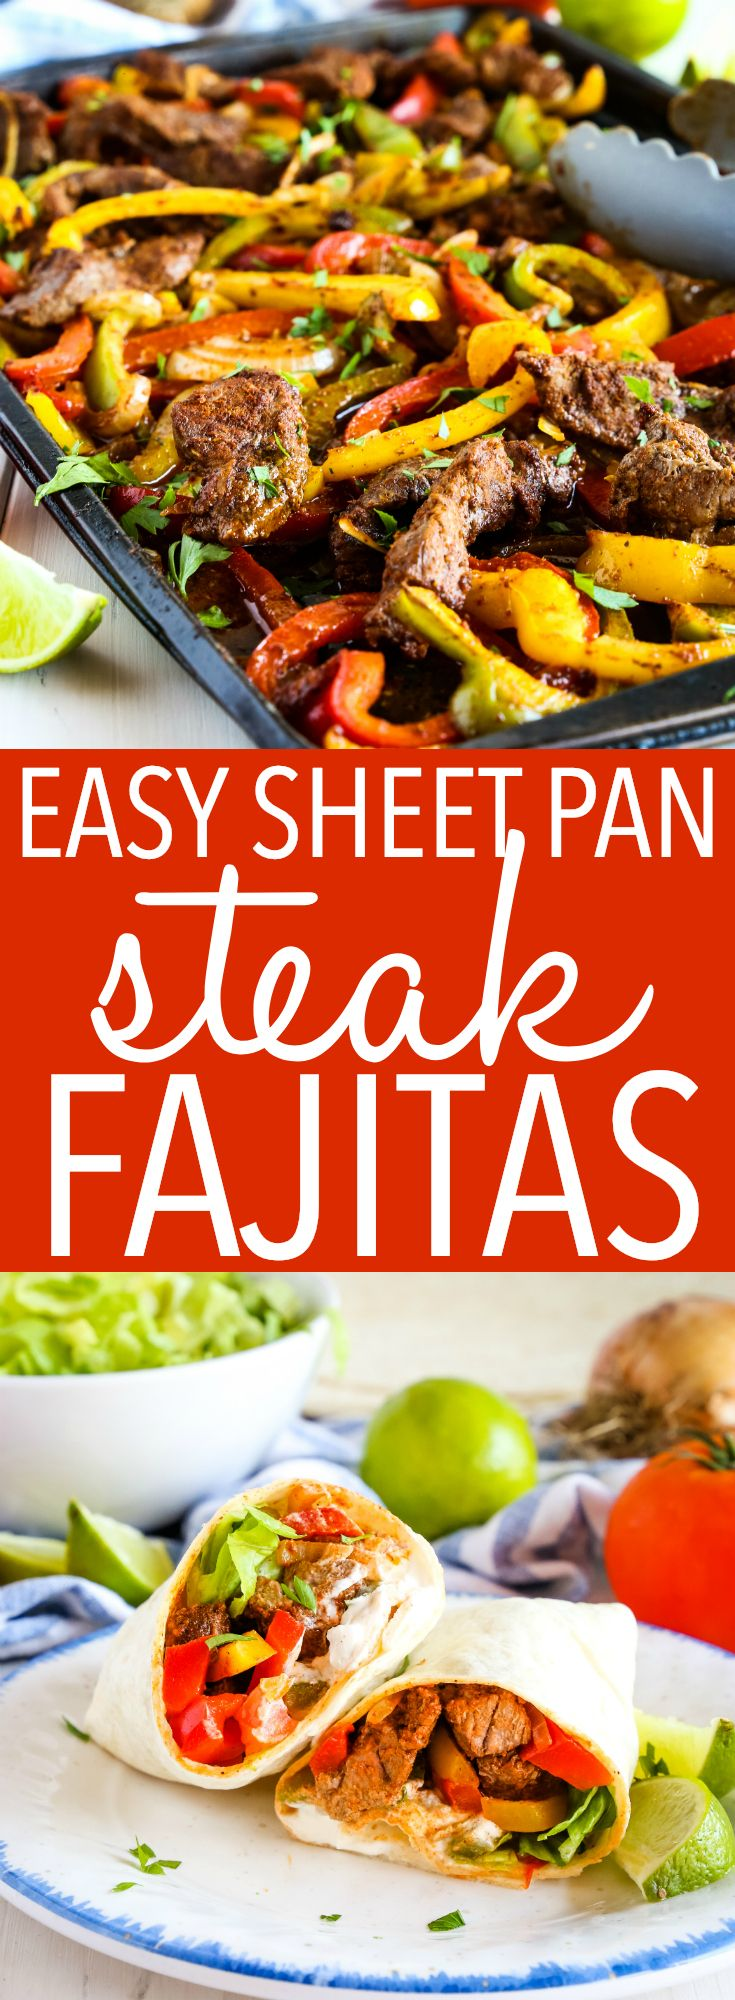 Easy Sheet Pan Steak Fajitas #healthyweeknightmeals